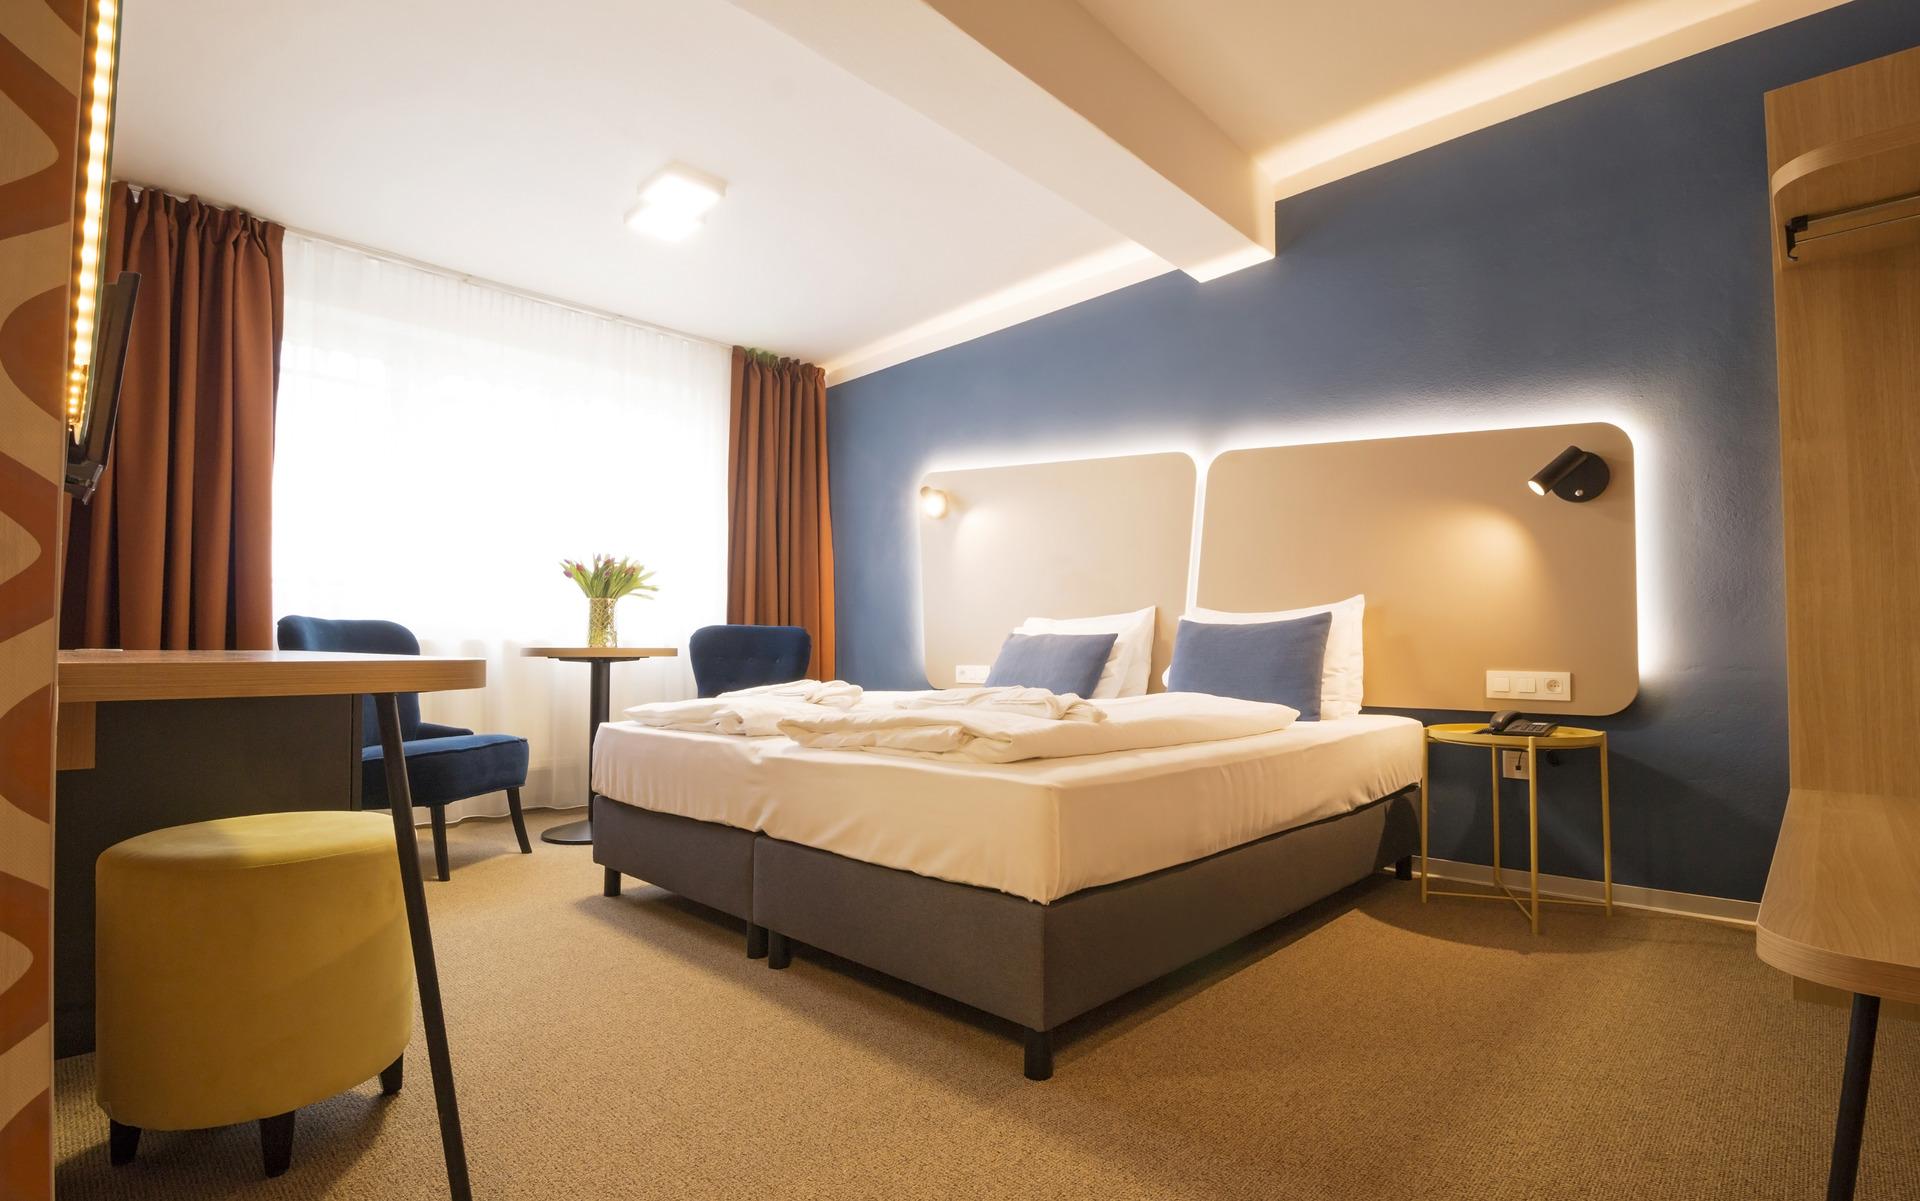 fe28133520 Mobil  00421  917 460 625 e-mail  info hotelthermal.sk. Adresa  Hotel  Thermal Varga    Promenádna 595 1